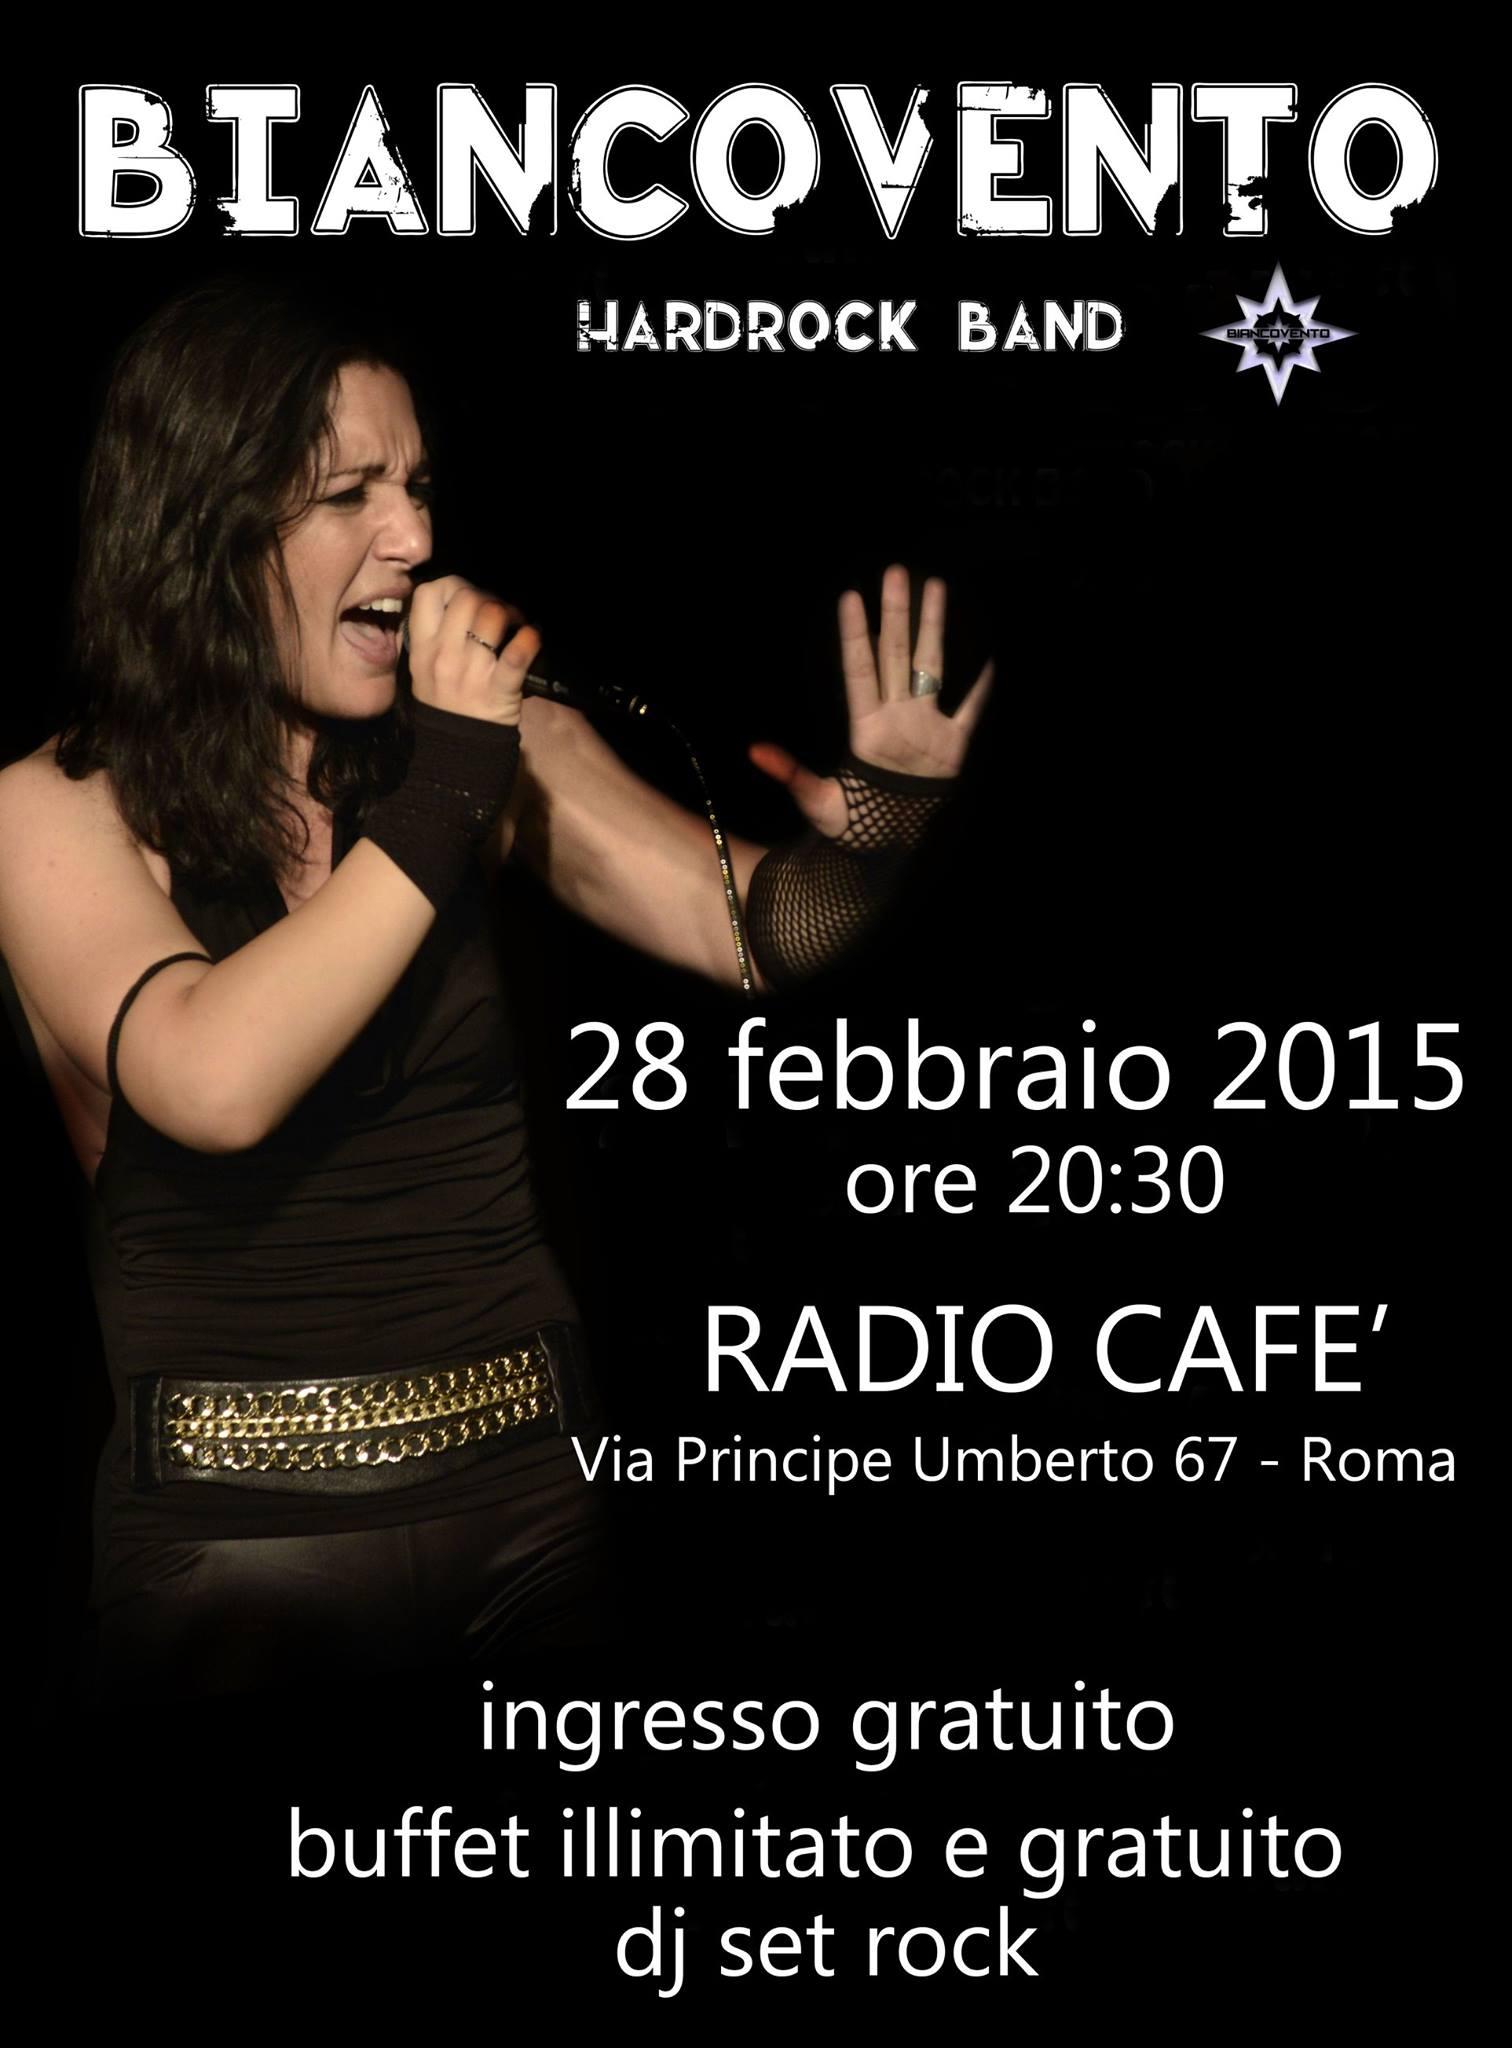 Biancovento @ Radio Cafè - 28 02 2015